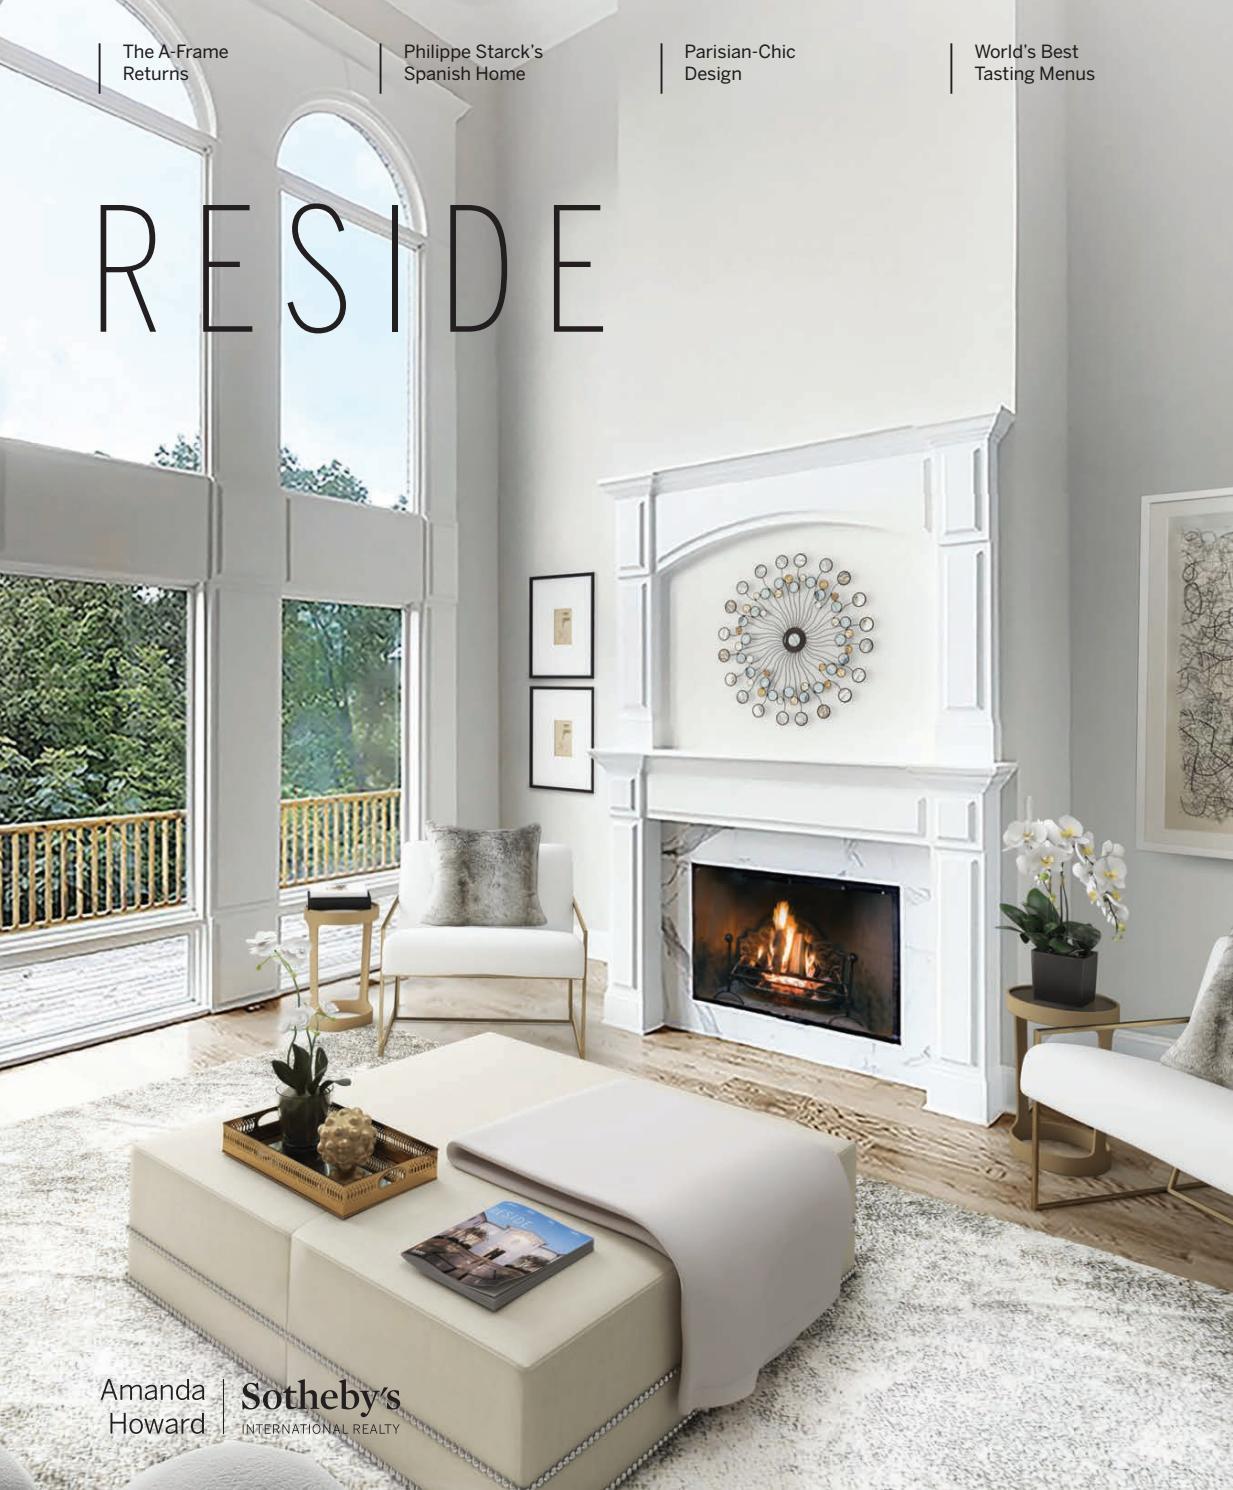 RESIDE - January 2019 Edition by amandahowardsir - issuu